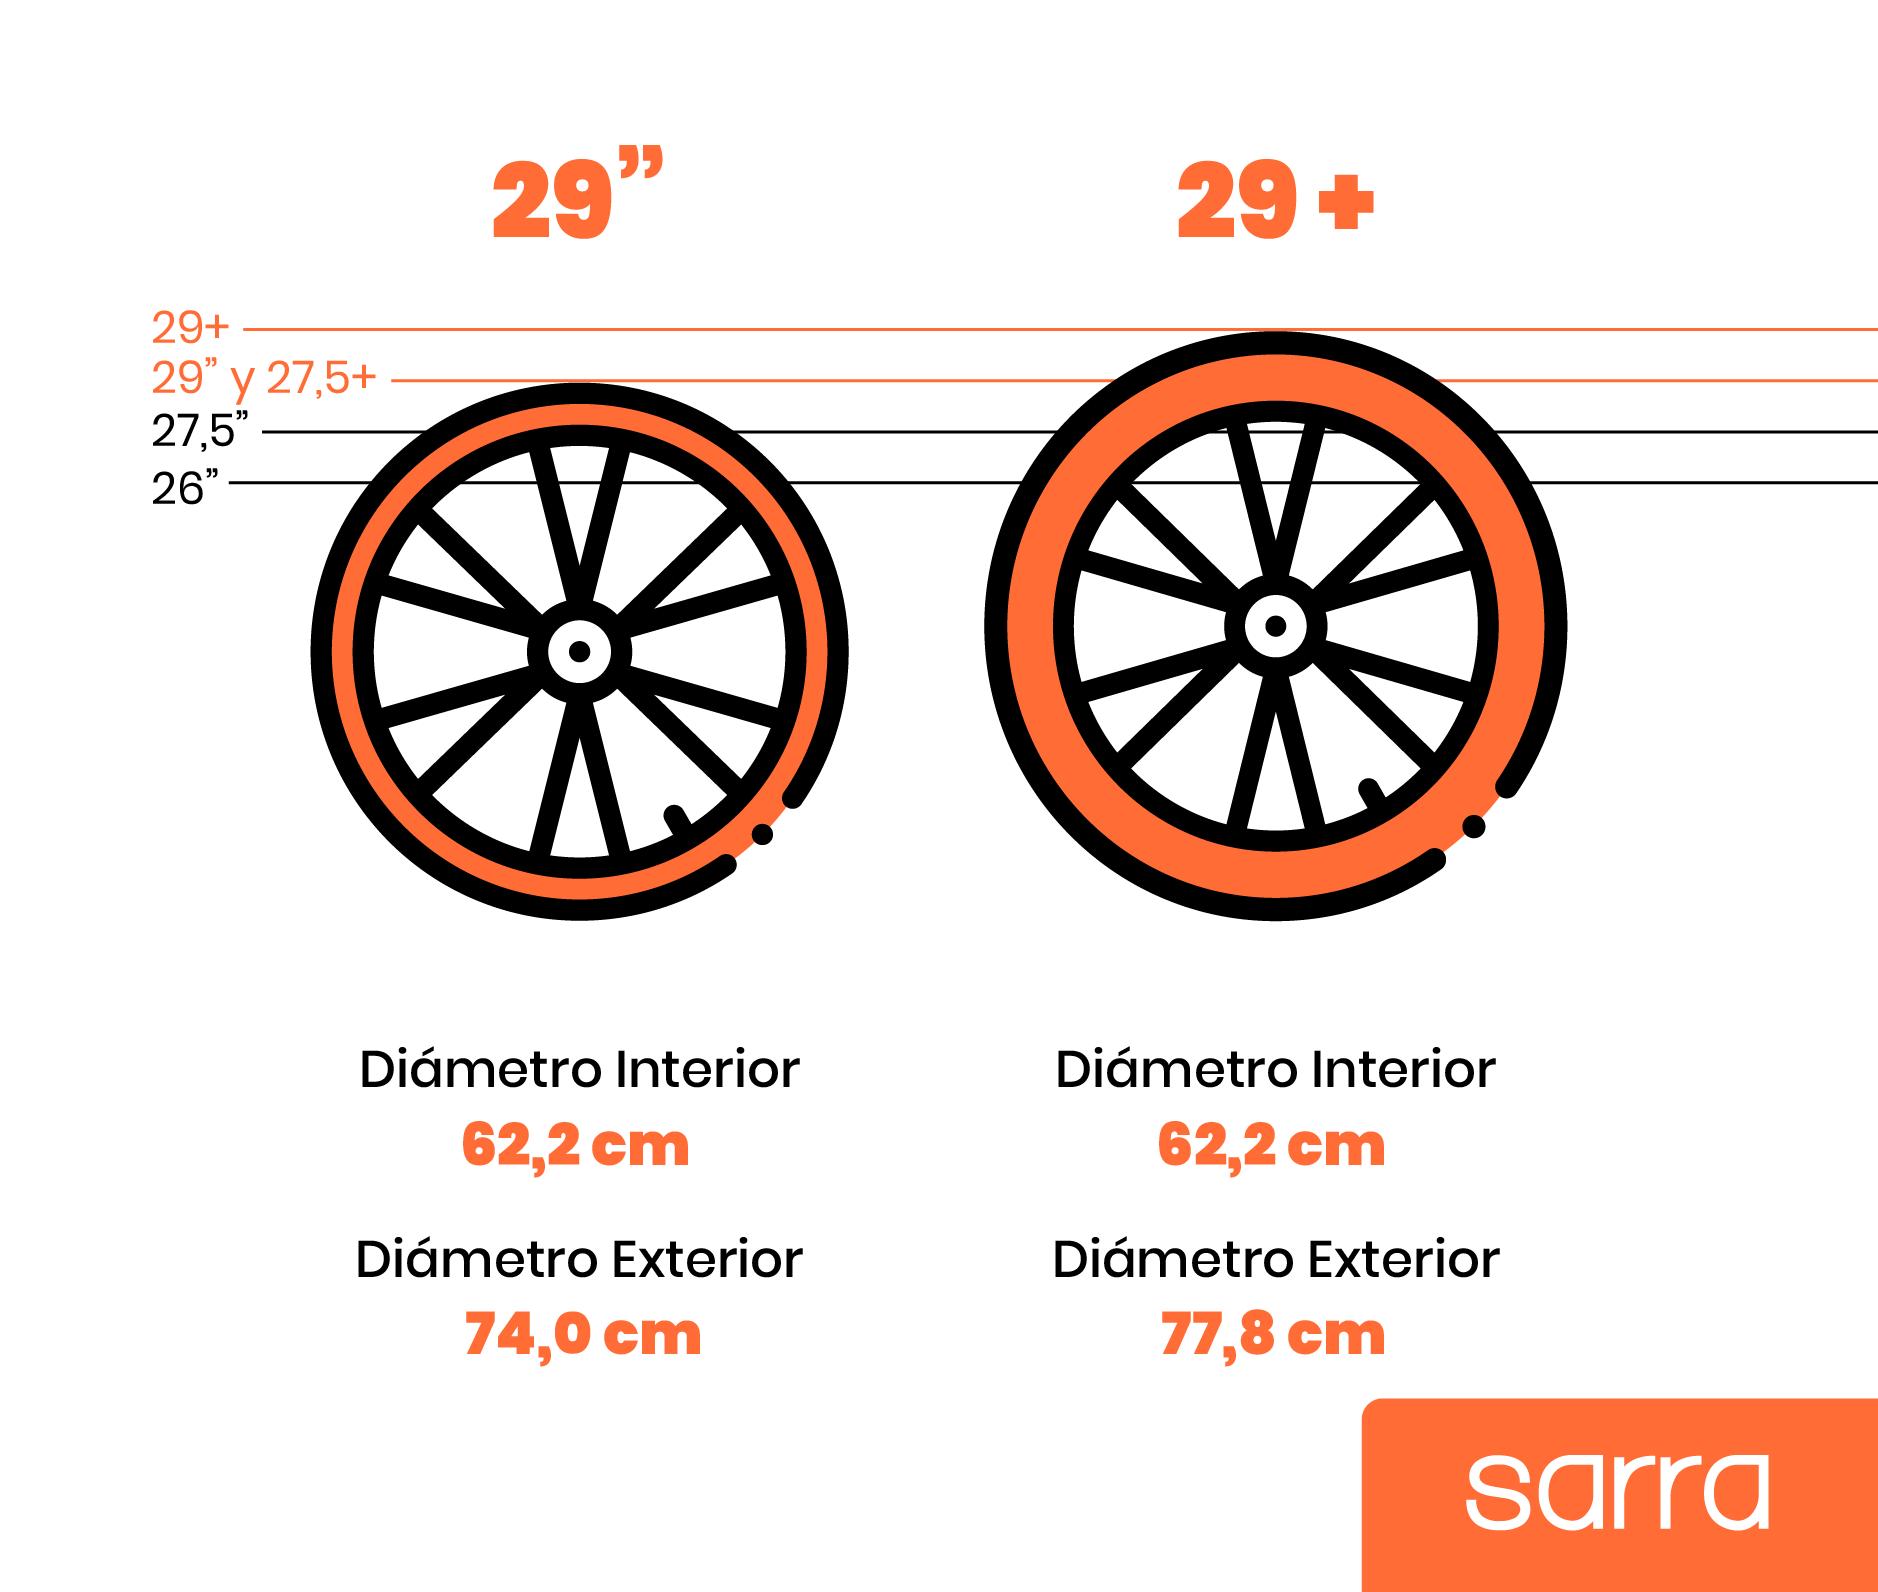 Seguro Bicicleta - Imagen ilustrativca tamaño de bicicleta rodado 29